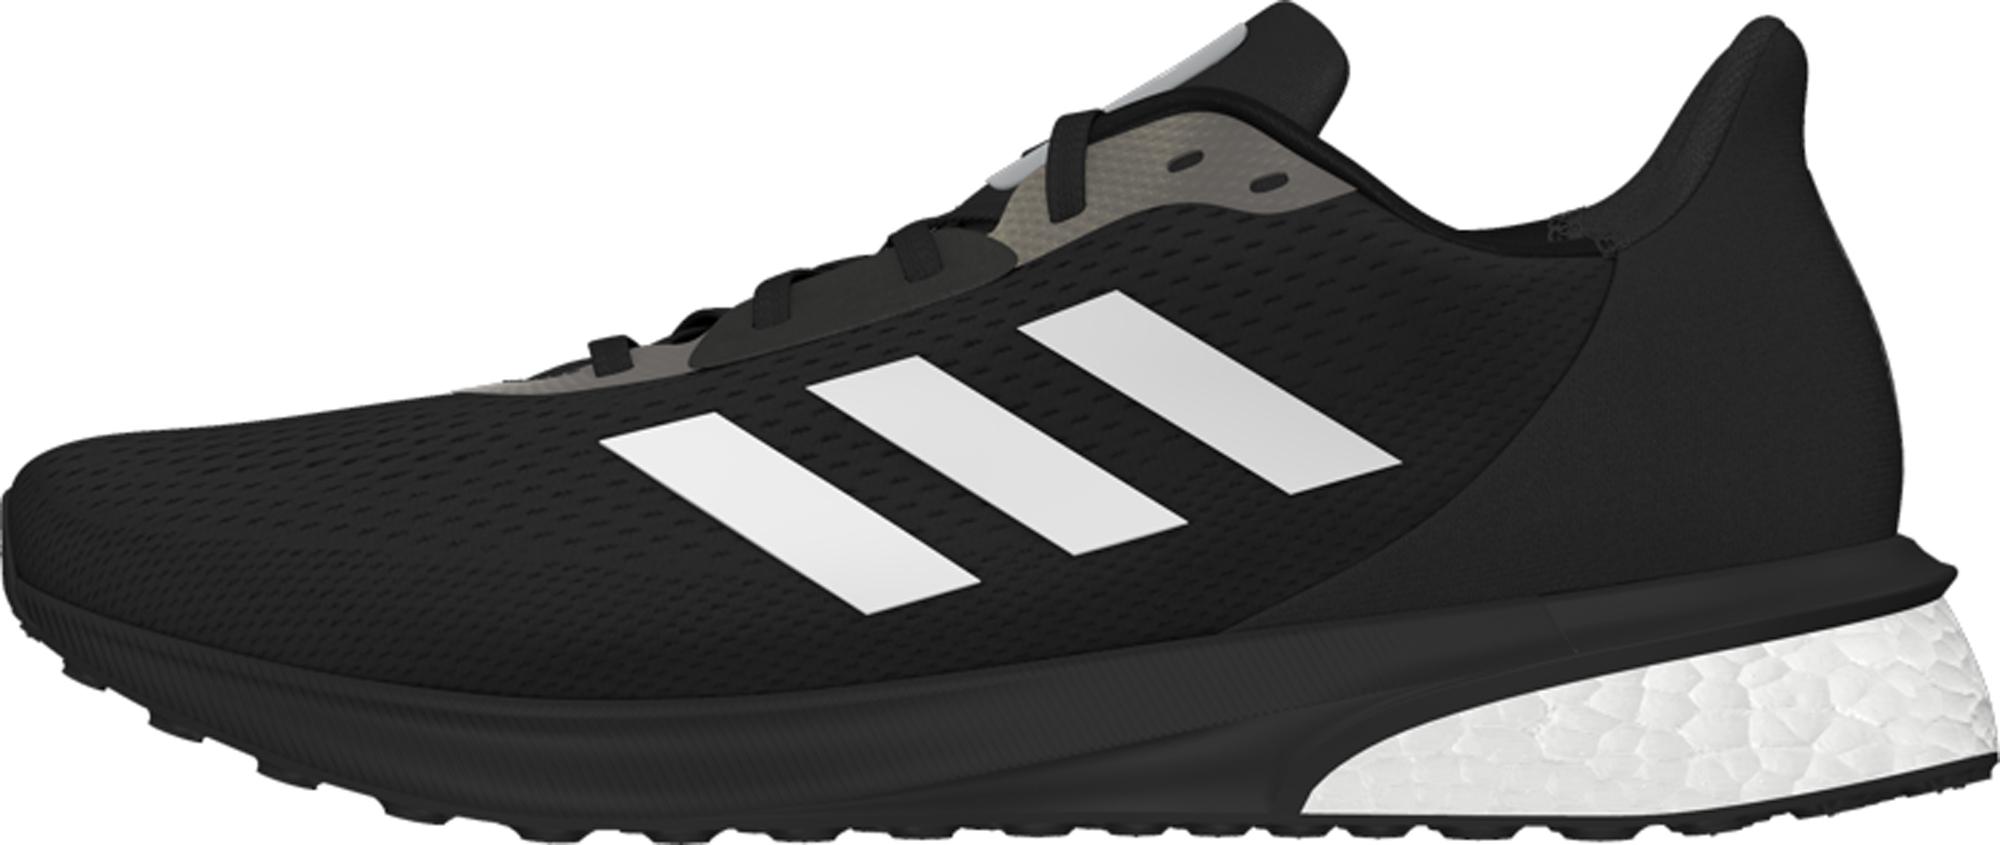 Adidas Кроссовки мужские Astrarun, размер 43